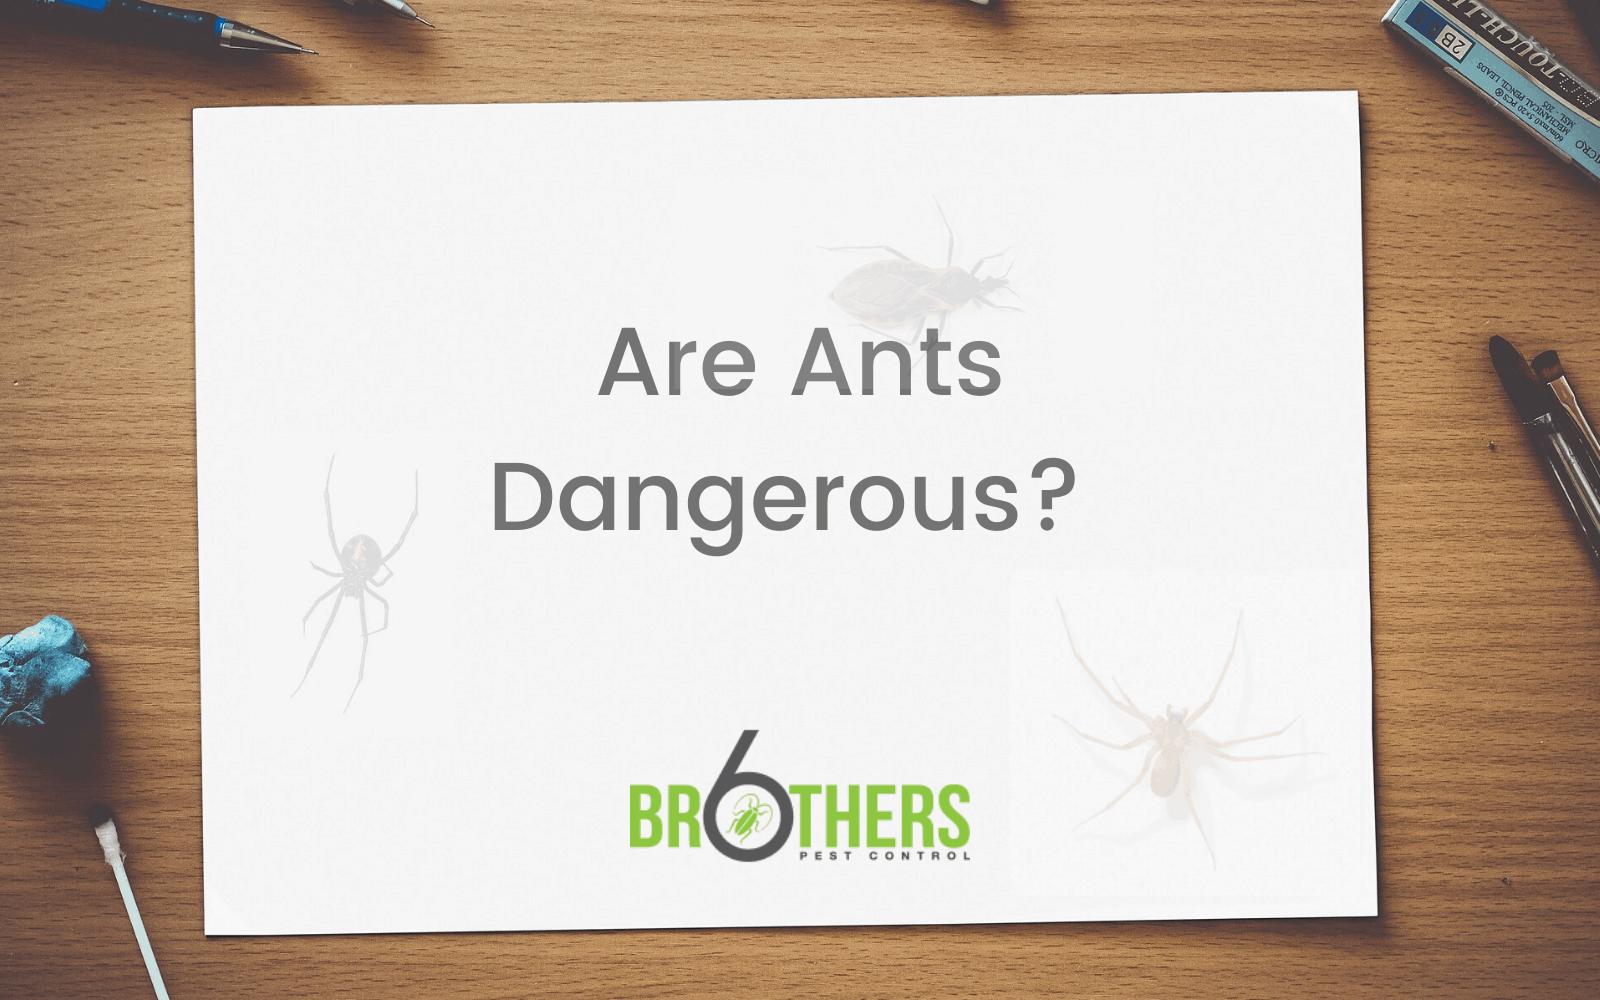 Are Ants Dangerous?